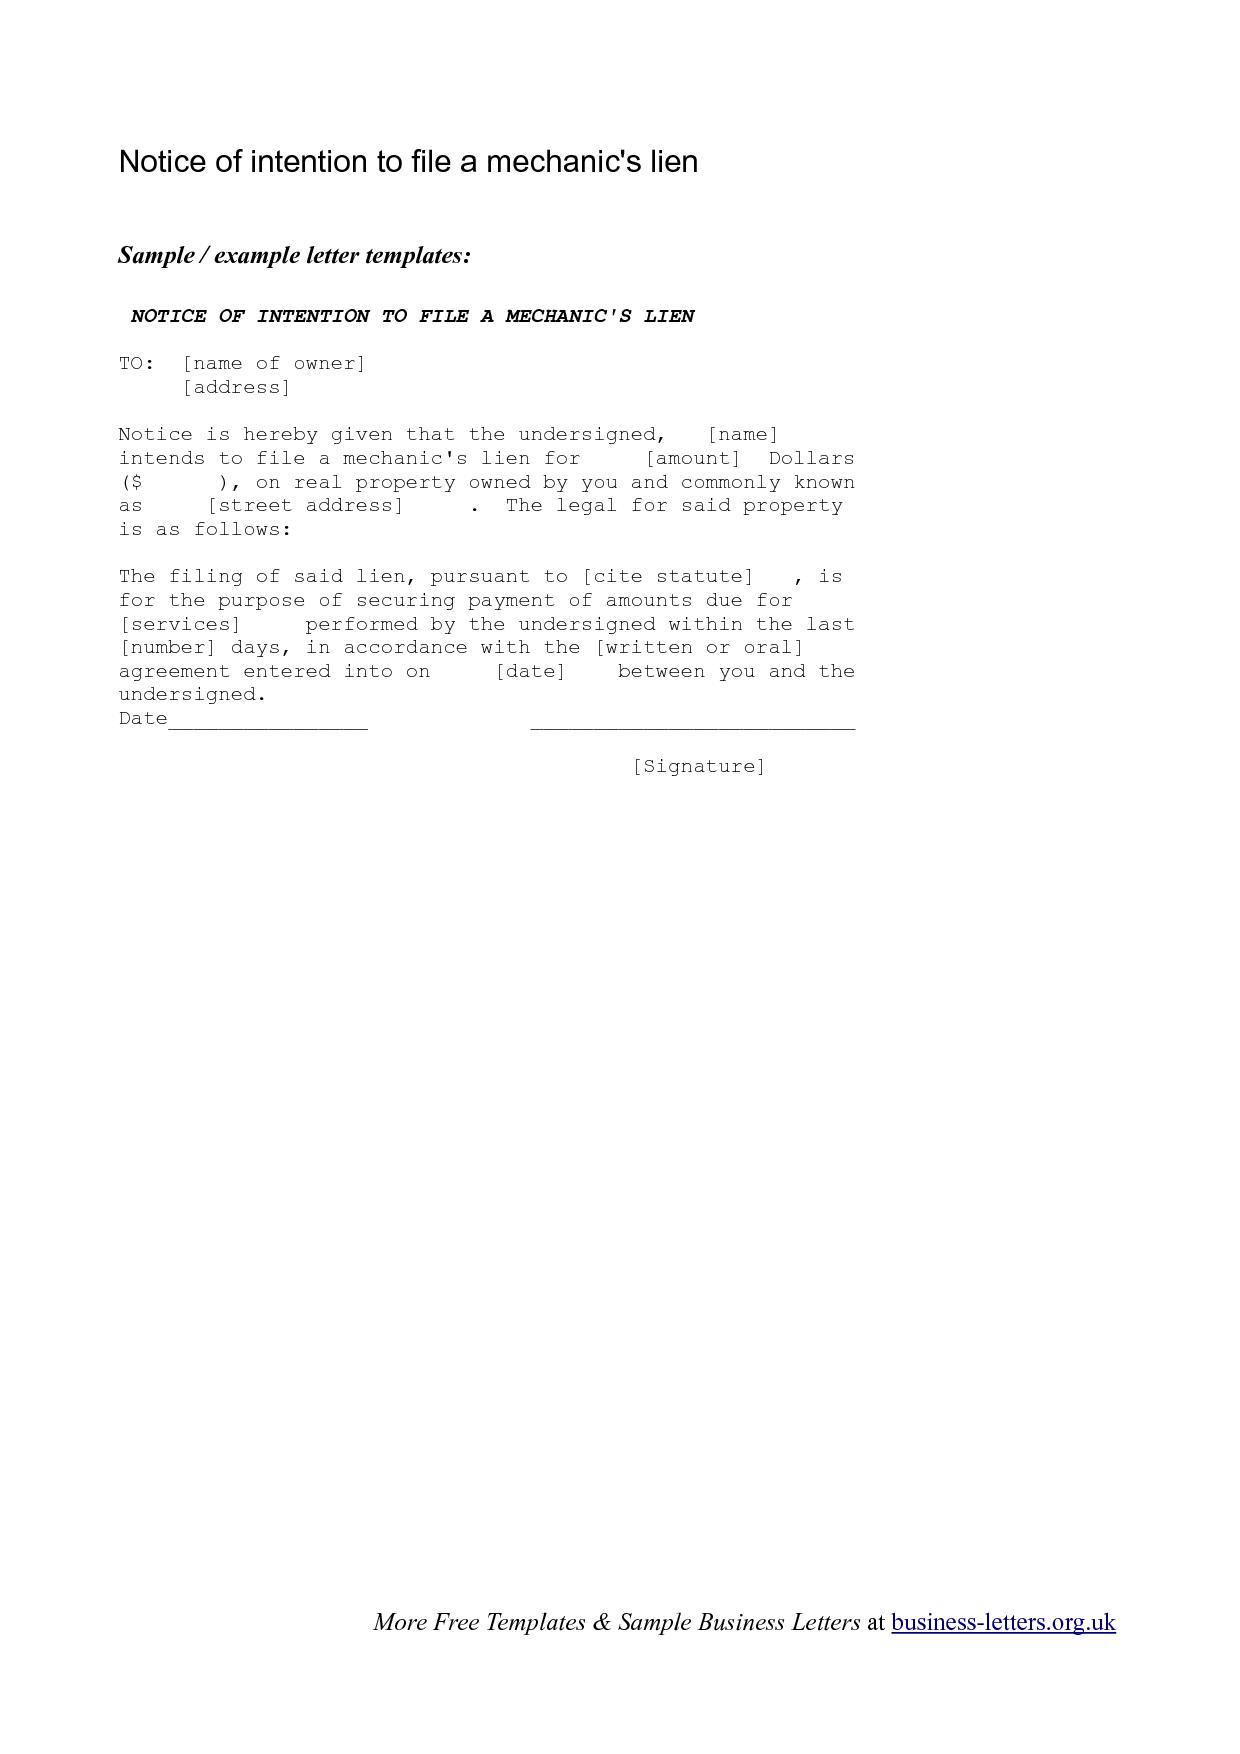 Notice Of Lien Letter Template - Letter T to File Lien Mechanics Motavera Inspirations